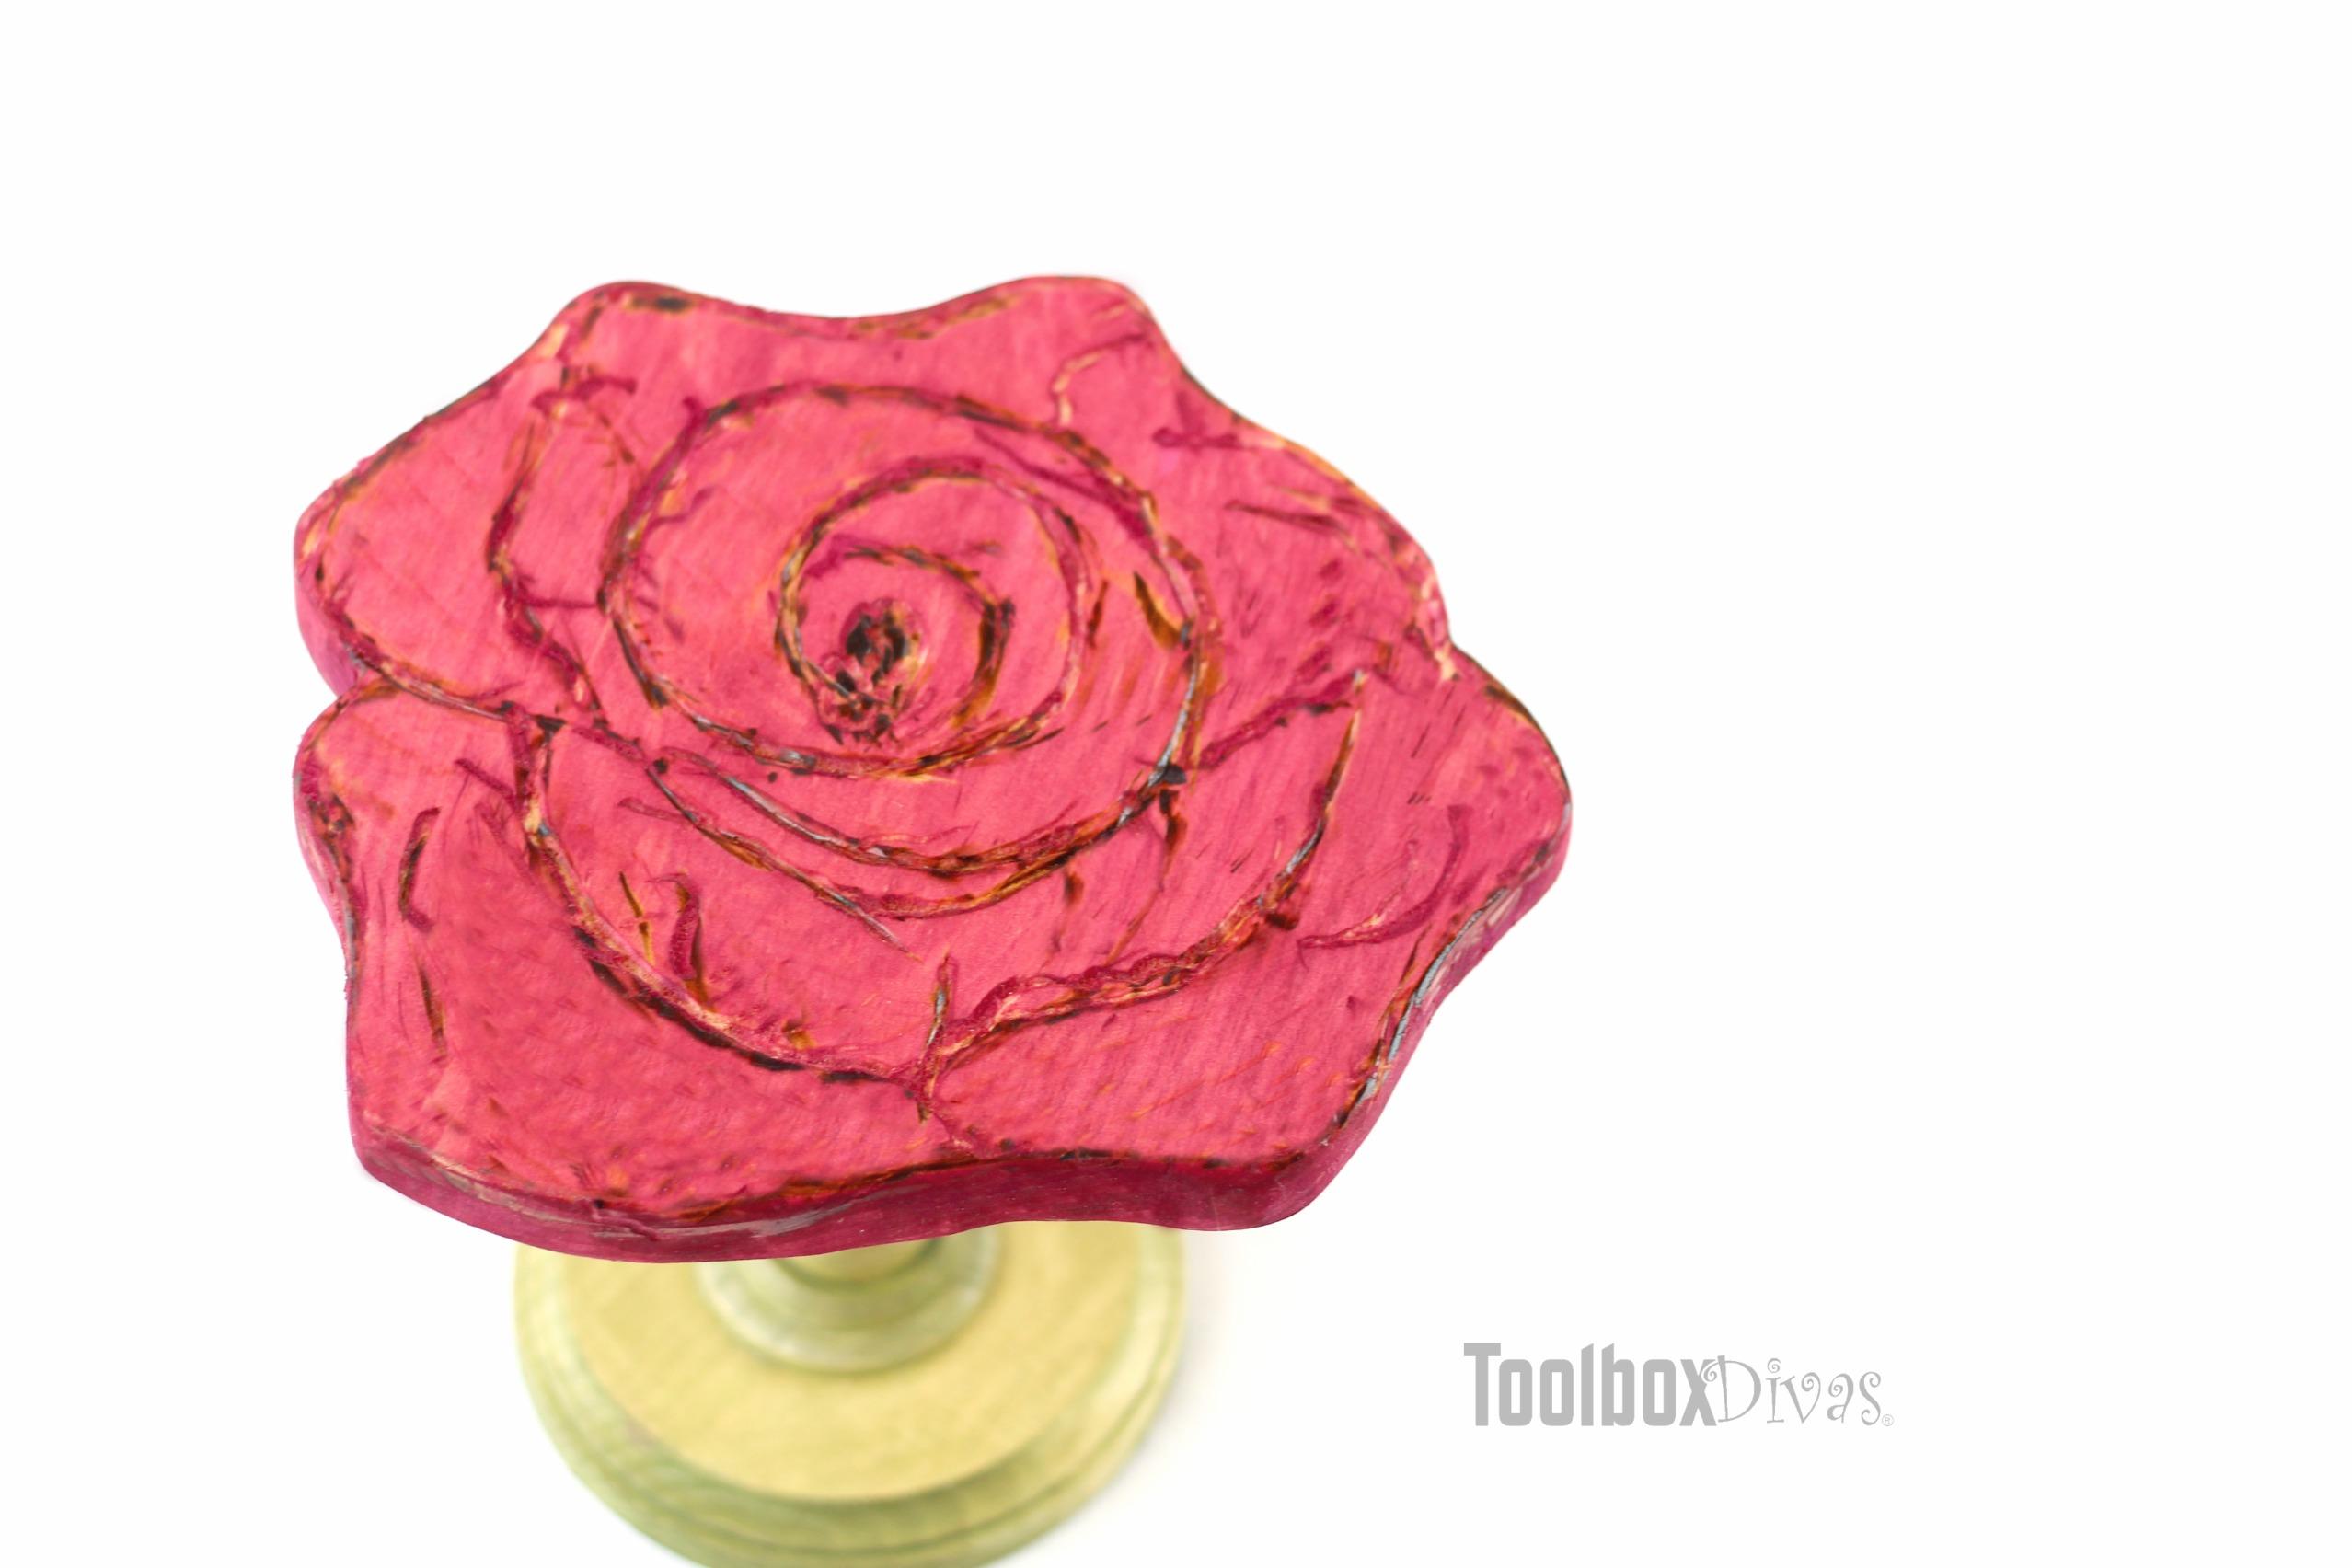 Rose Cake Stand Top View Toolbox Divas Toolbox Divas